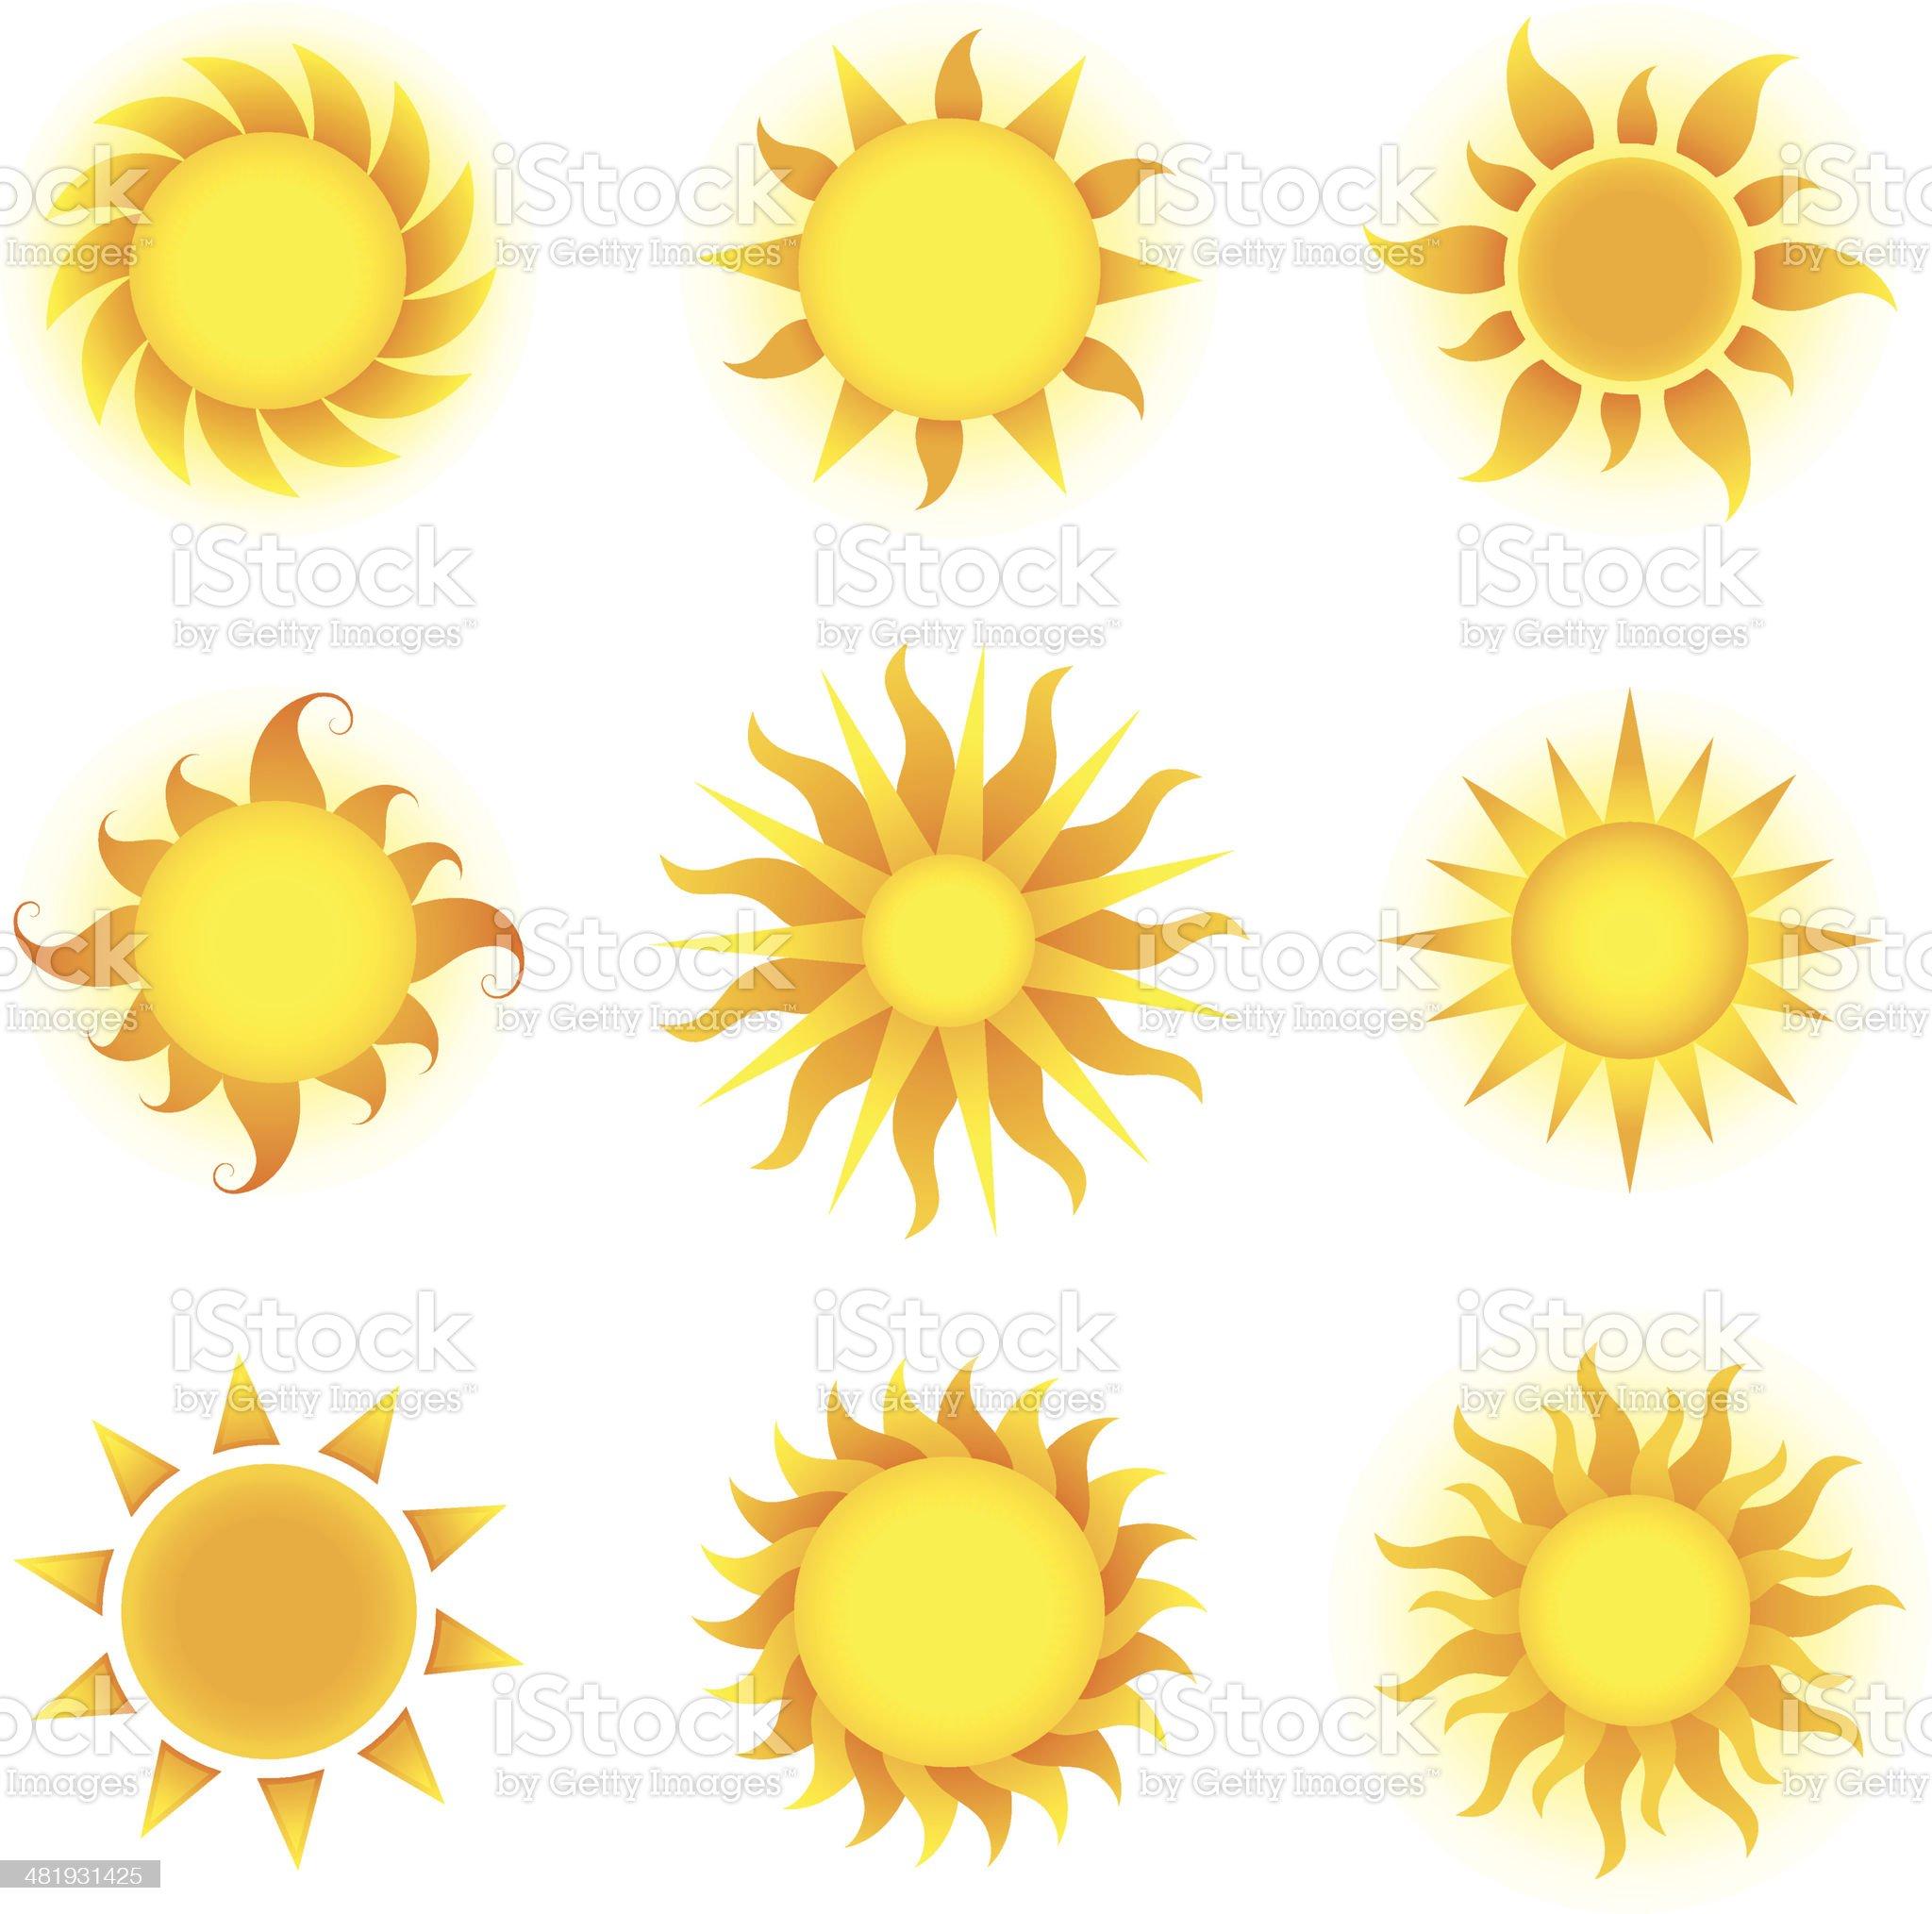 Set of bright yellow sun icons royalty-free stock vector art